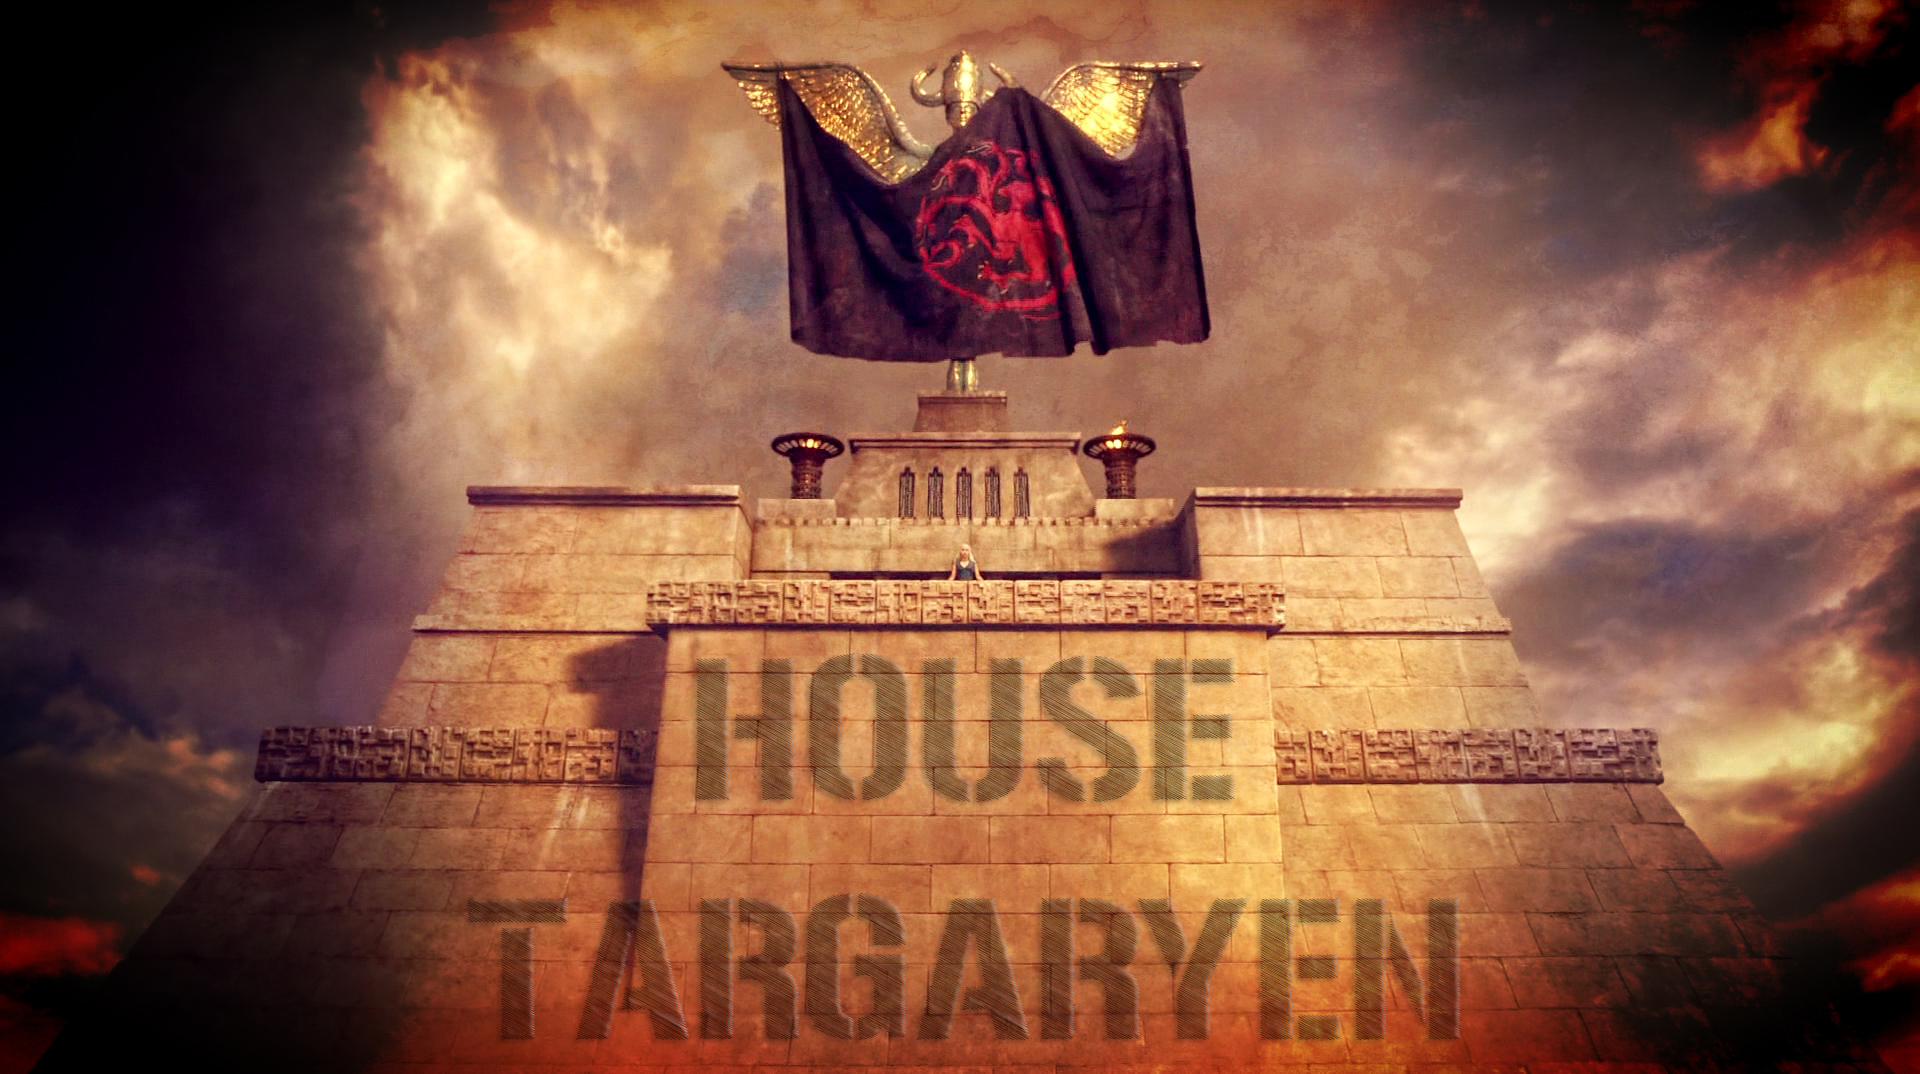 House Targaryen Daenerys Targaryen Wallpaper 37045587